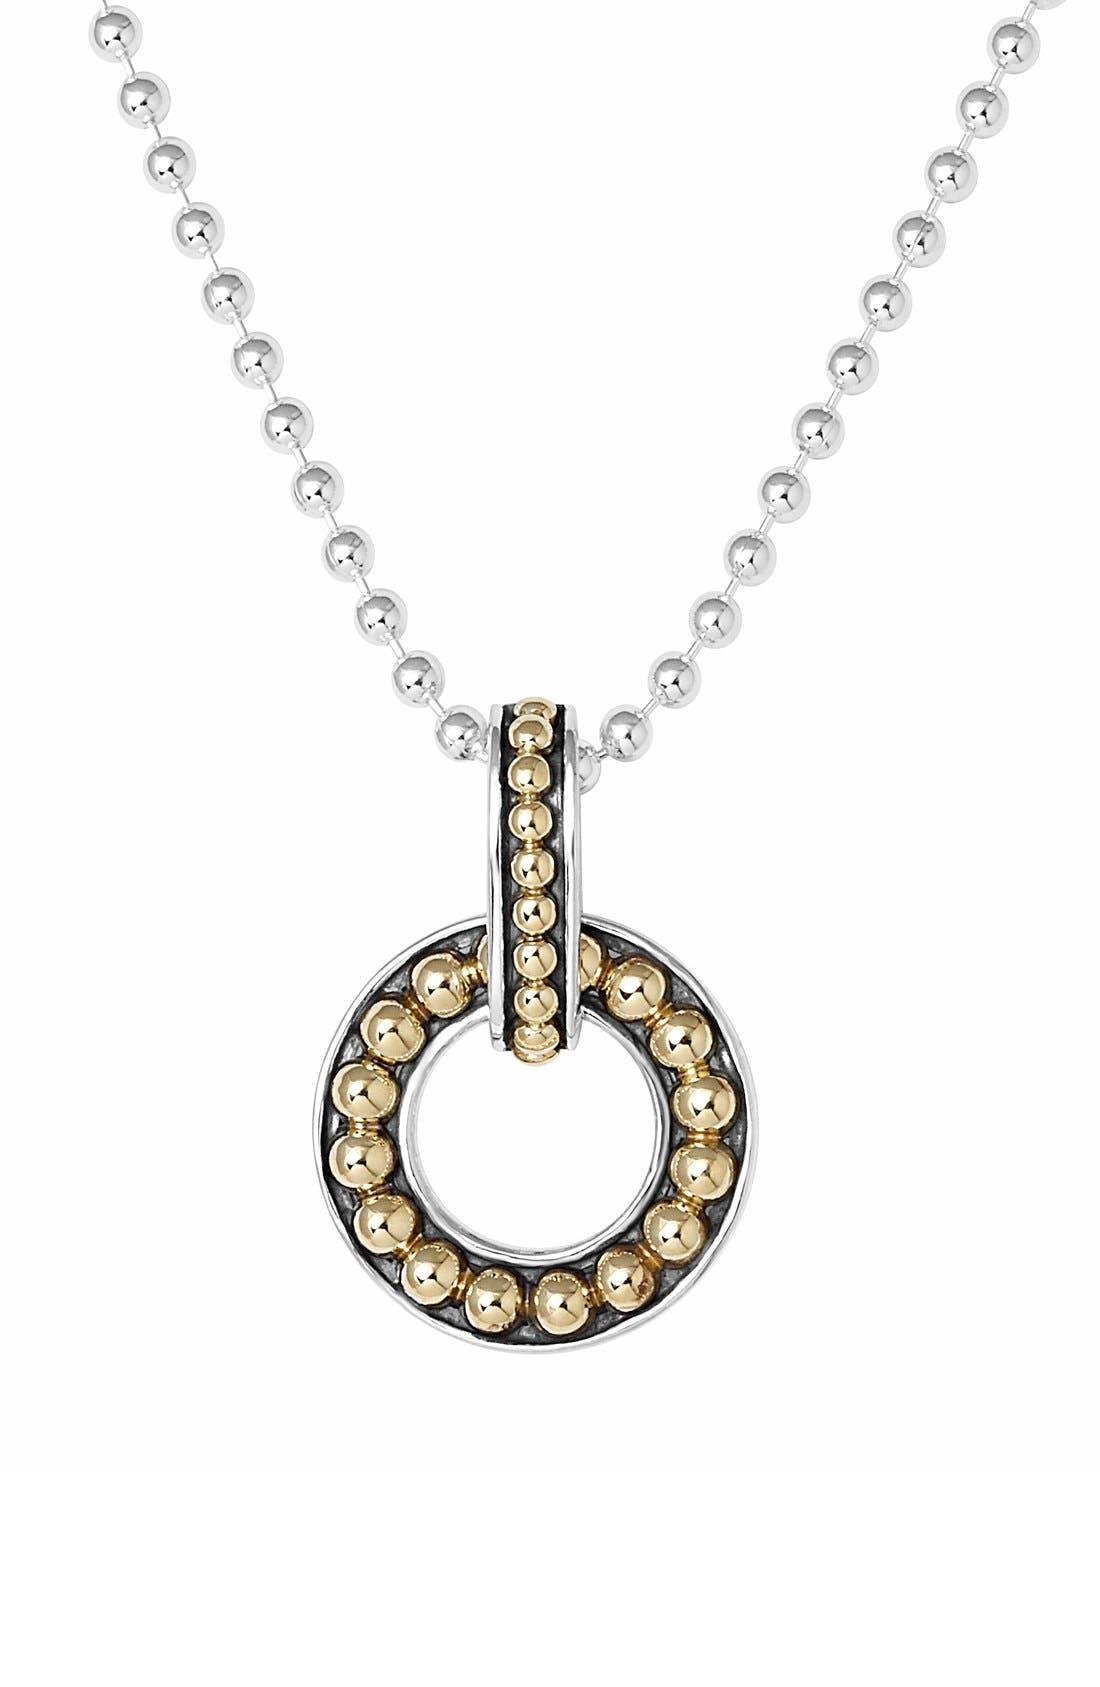 LAGOS 'Enso' Pendant Necklace